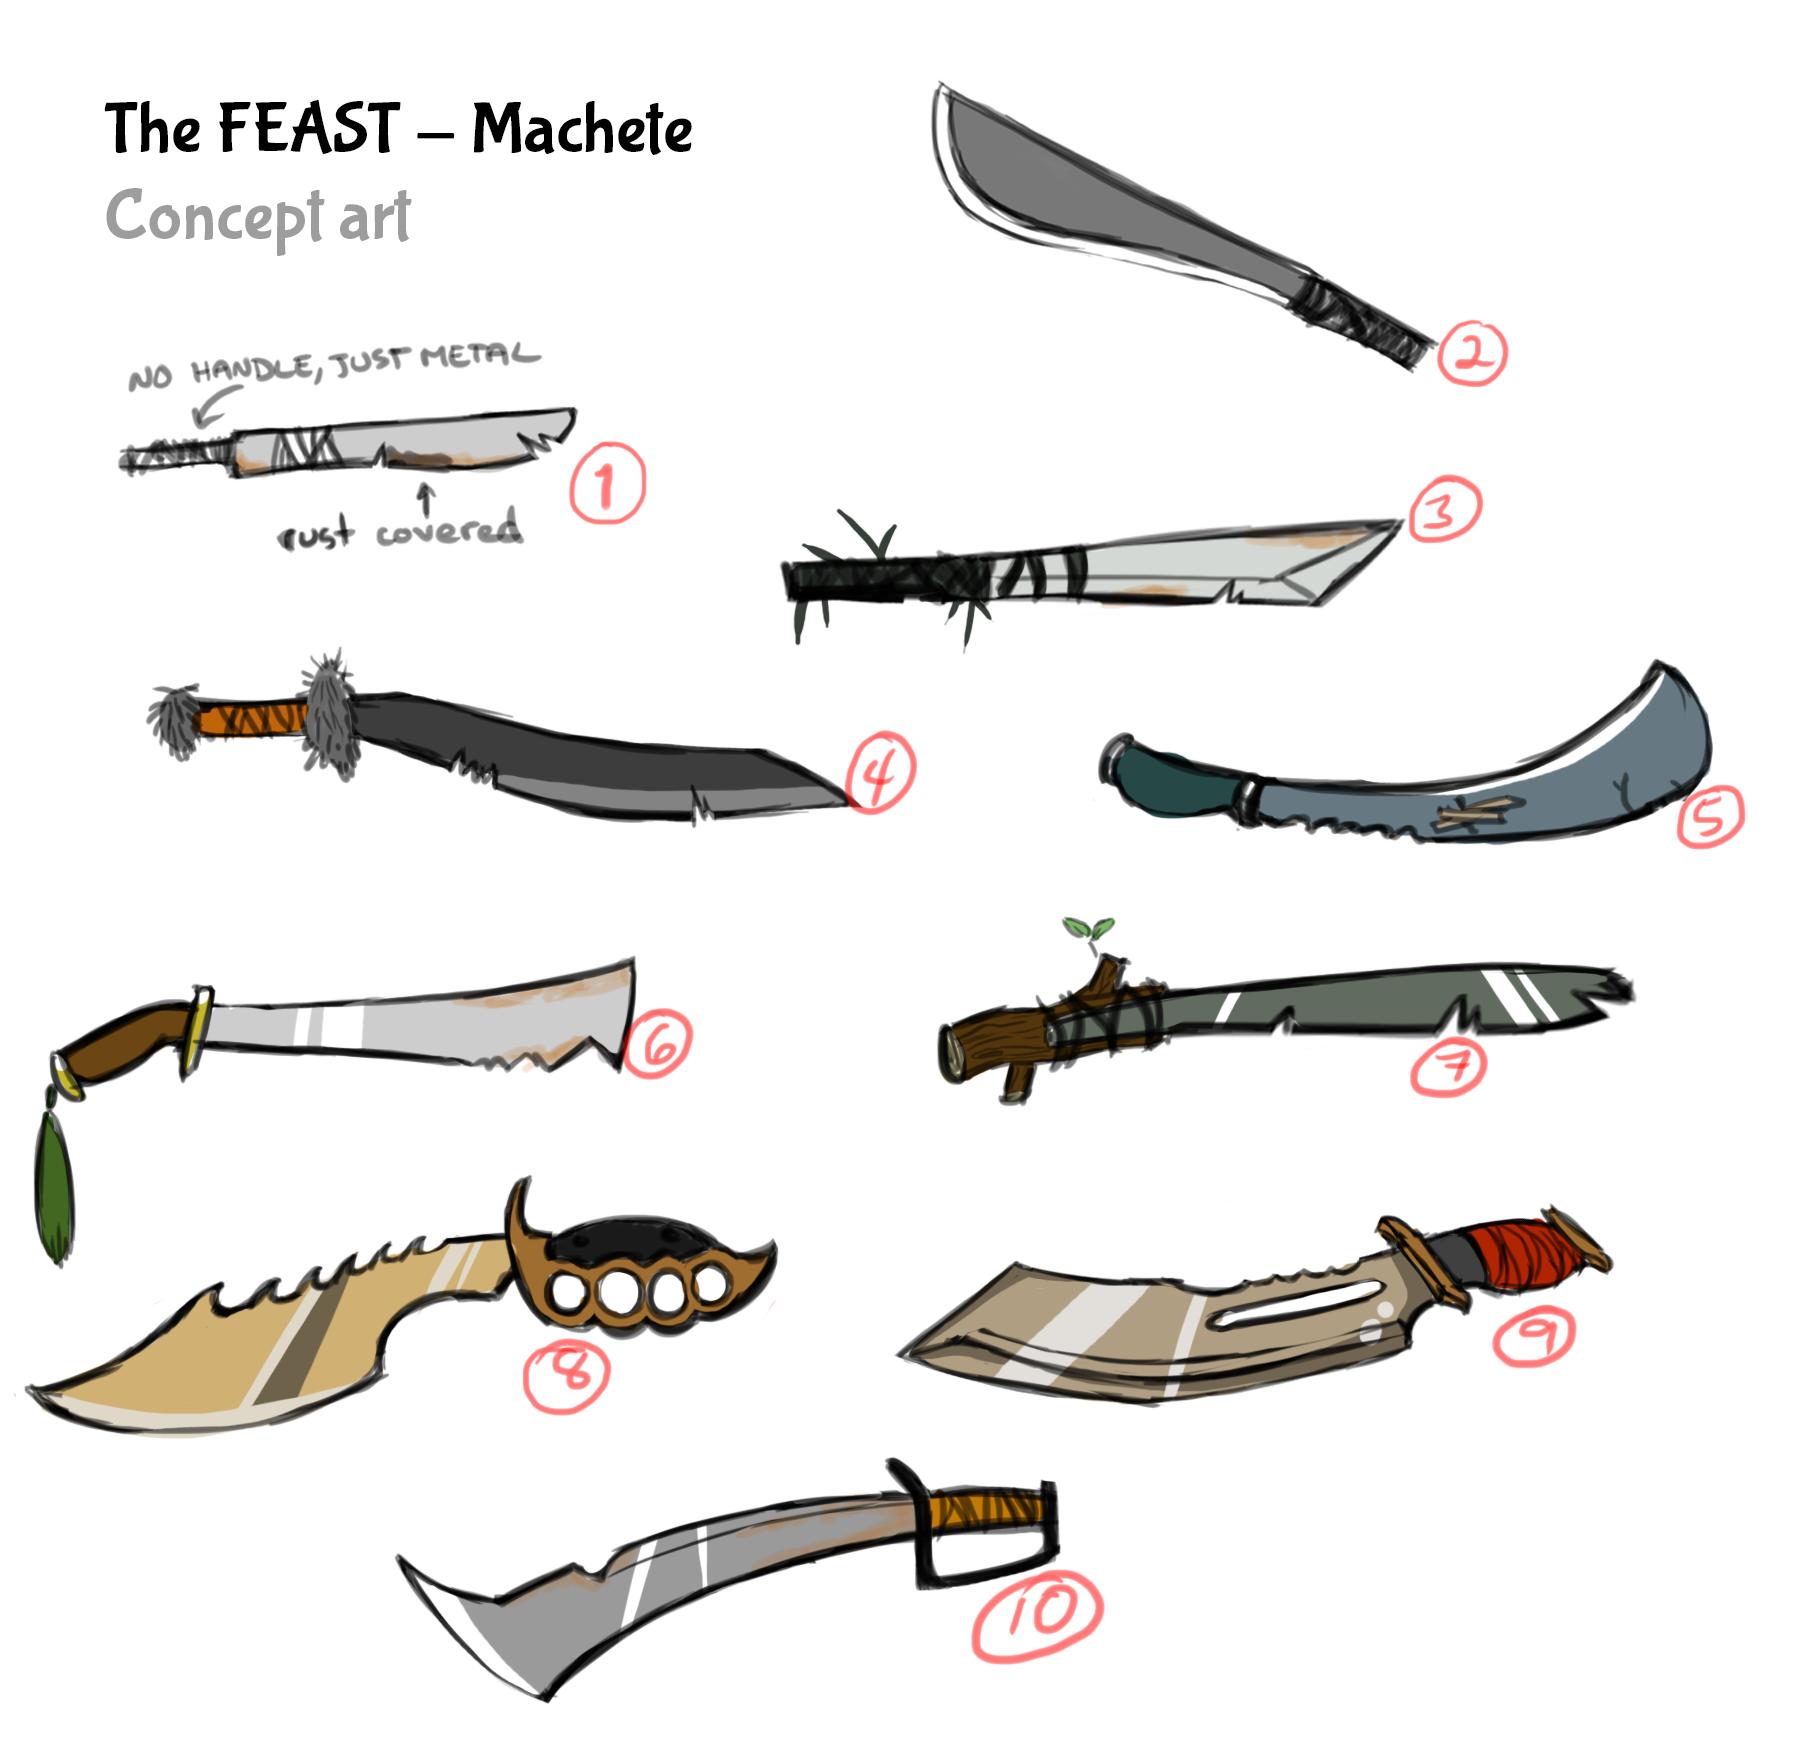 FEAST machete2